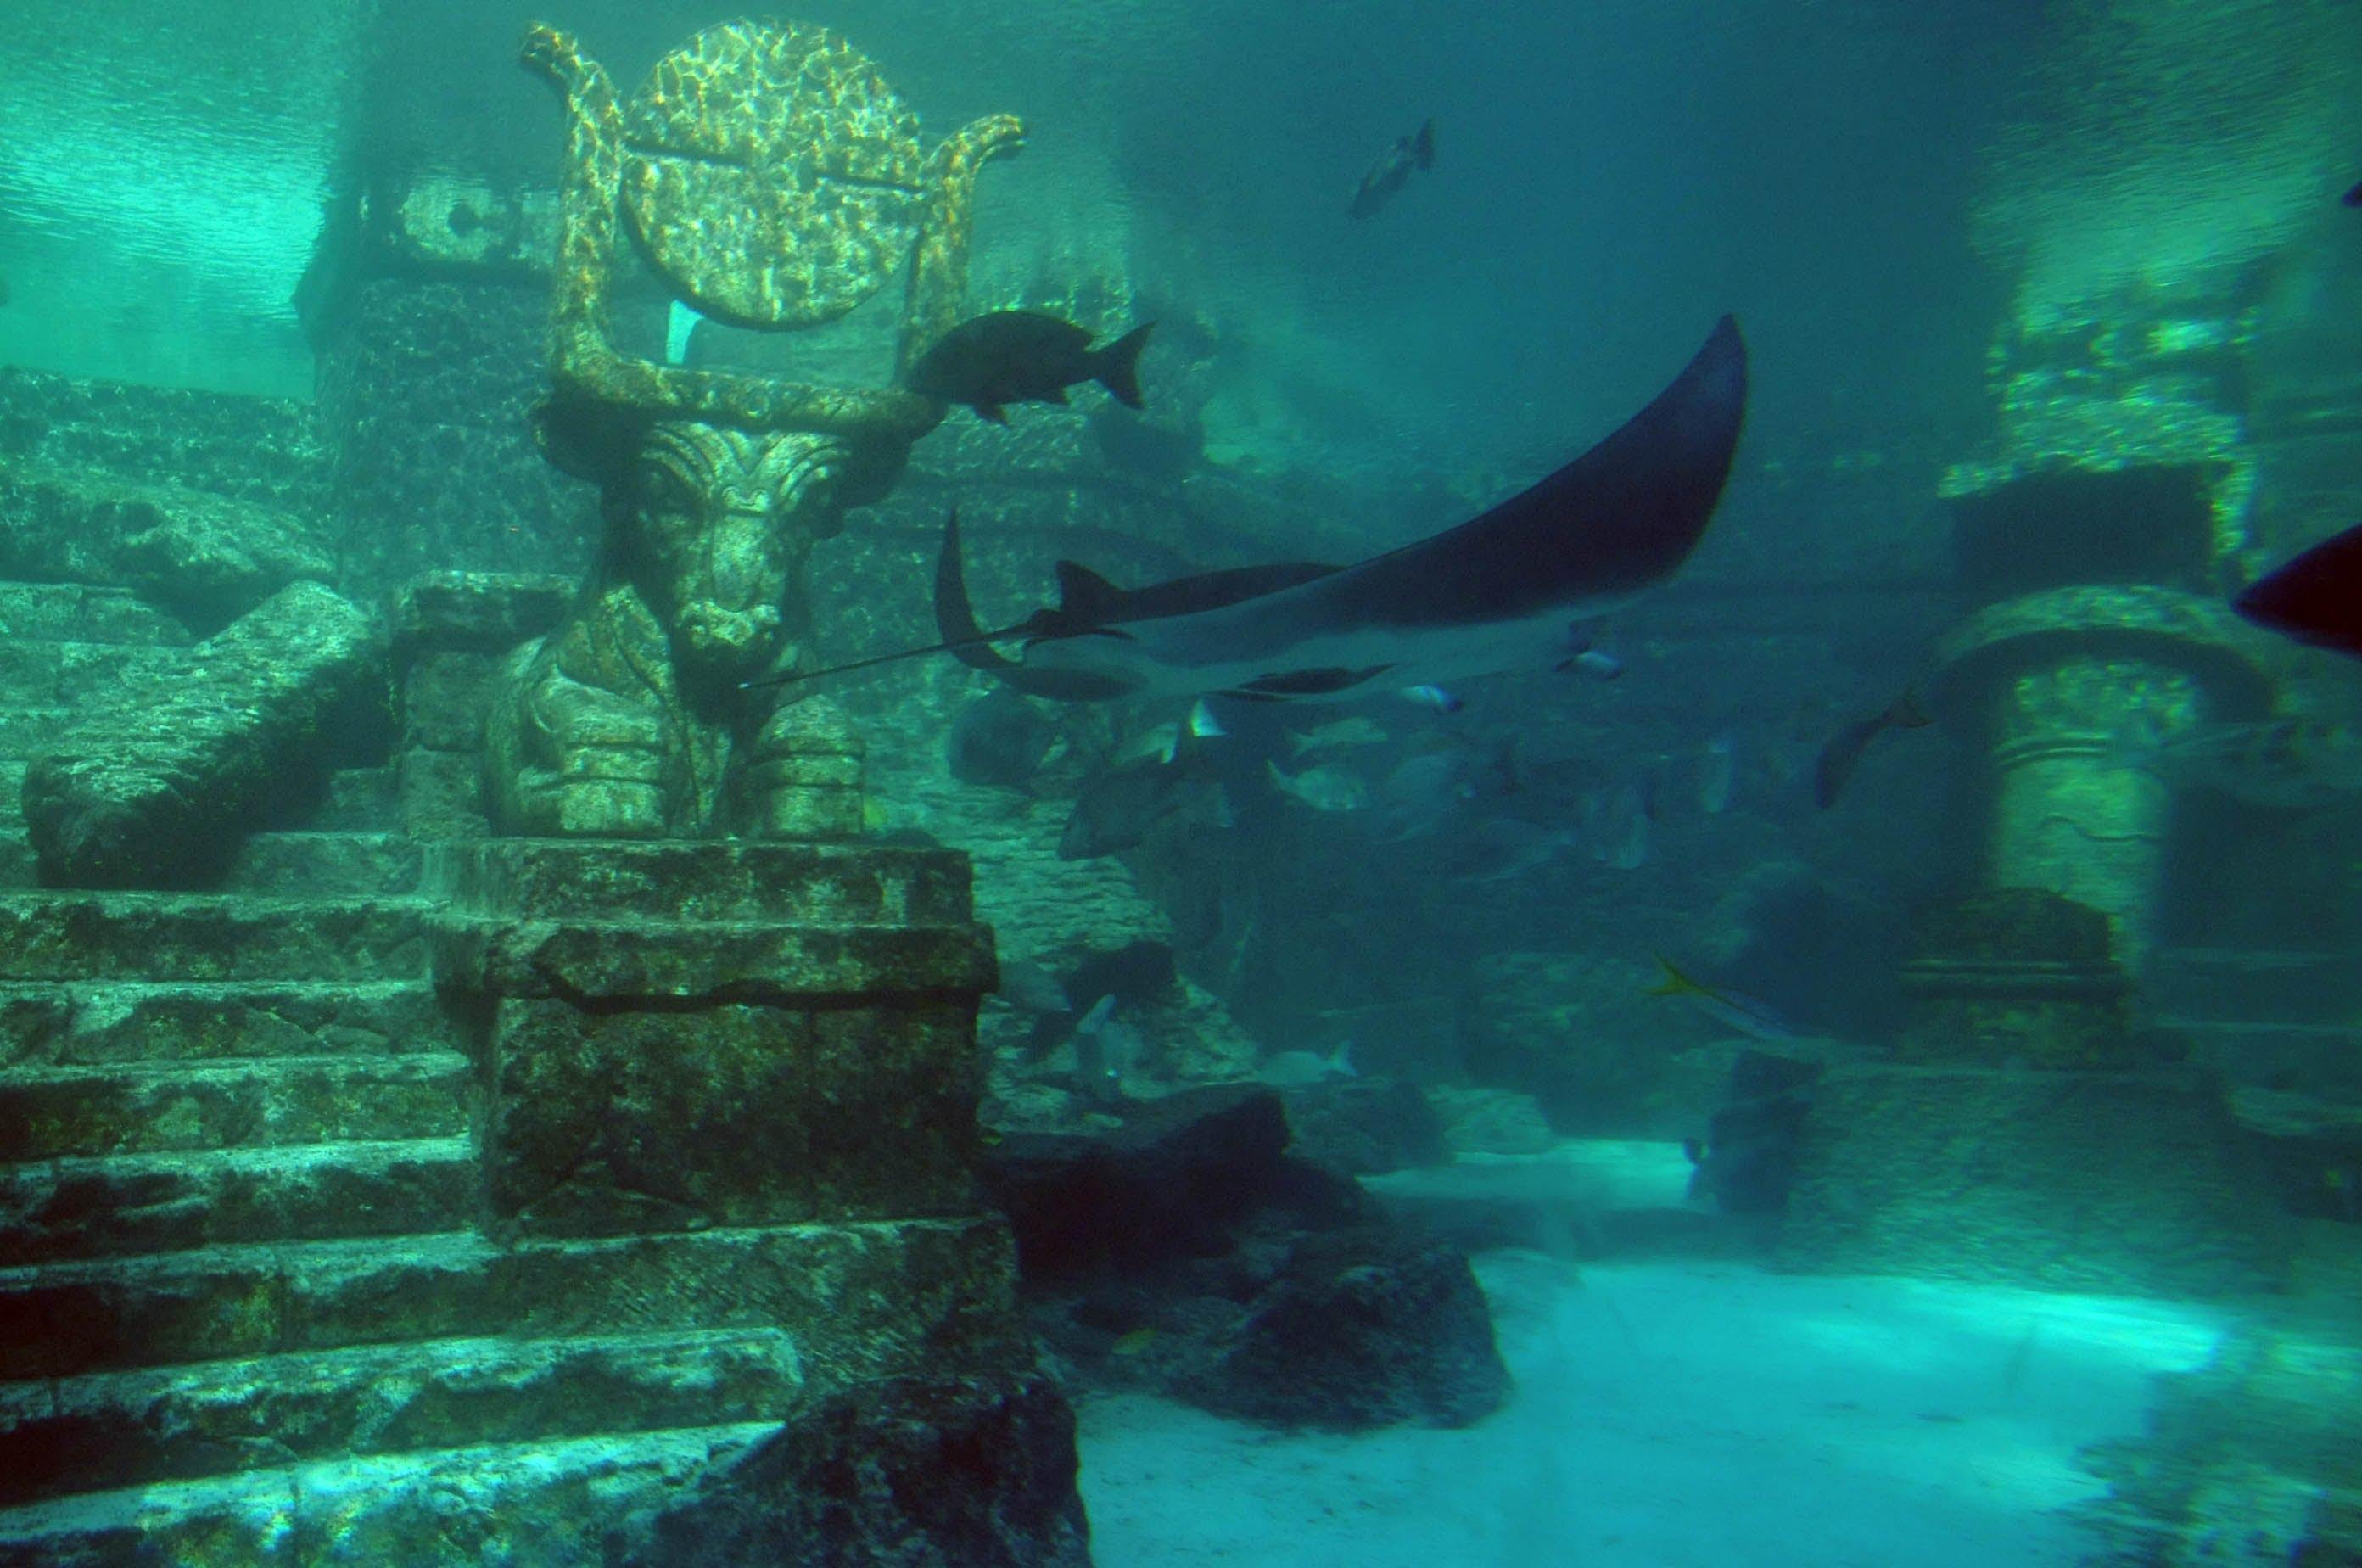 alien races under the atlantic ocean meditation bridge by sam